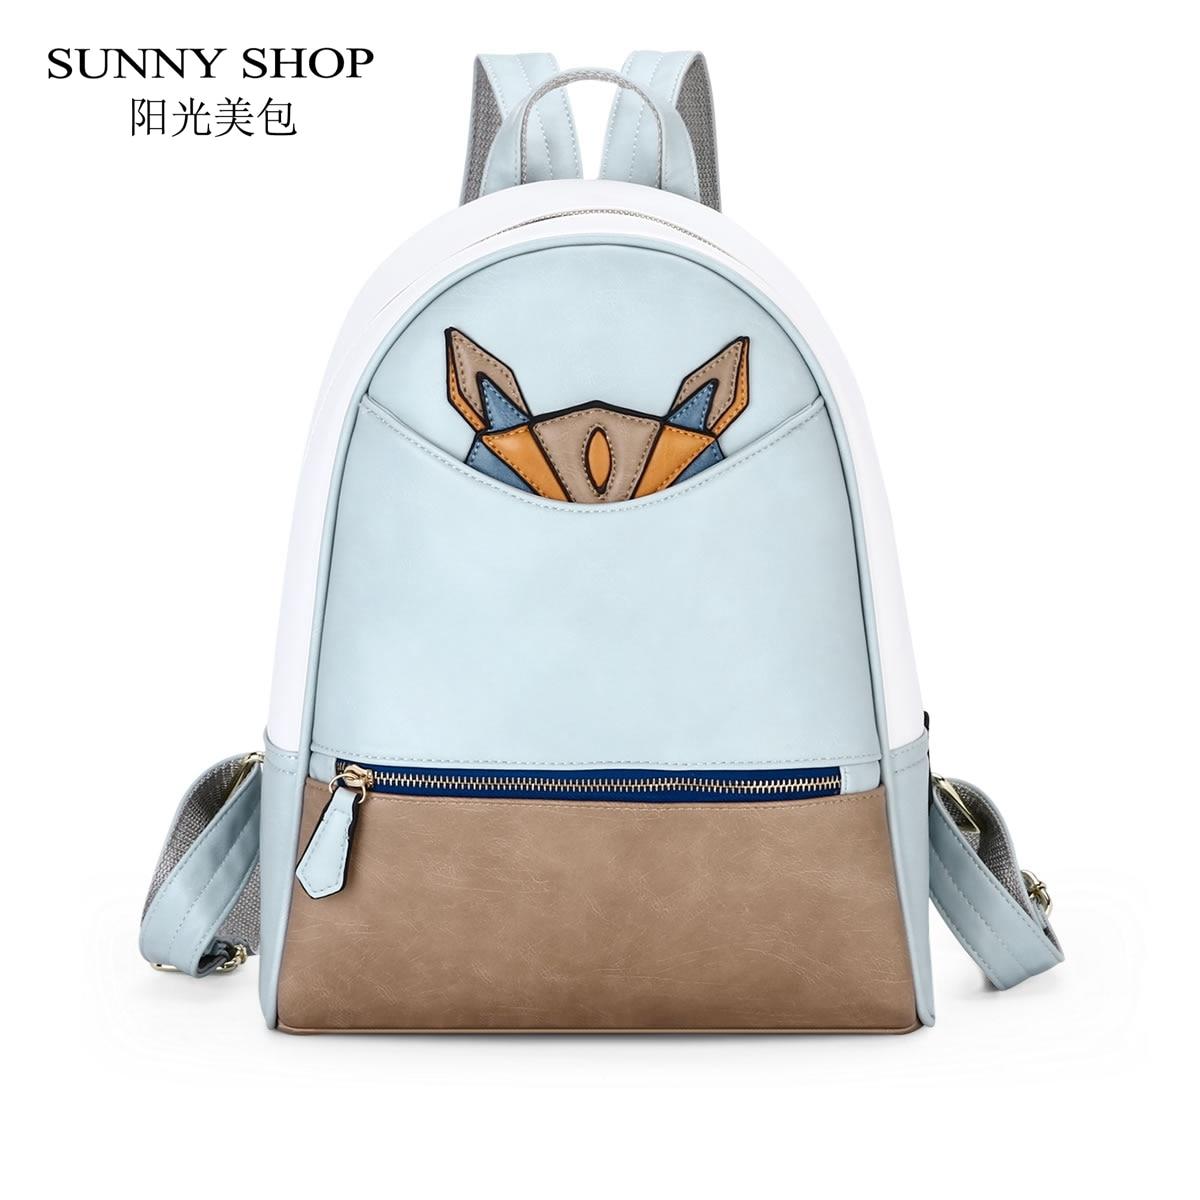 SUNNY SHOP Spanish Big School Backpack Korean Cute Women laptop Backpacks For Teenage Girls PU Leather Schoolbag bagpack A4